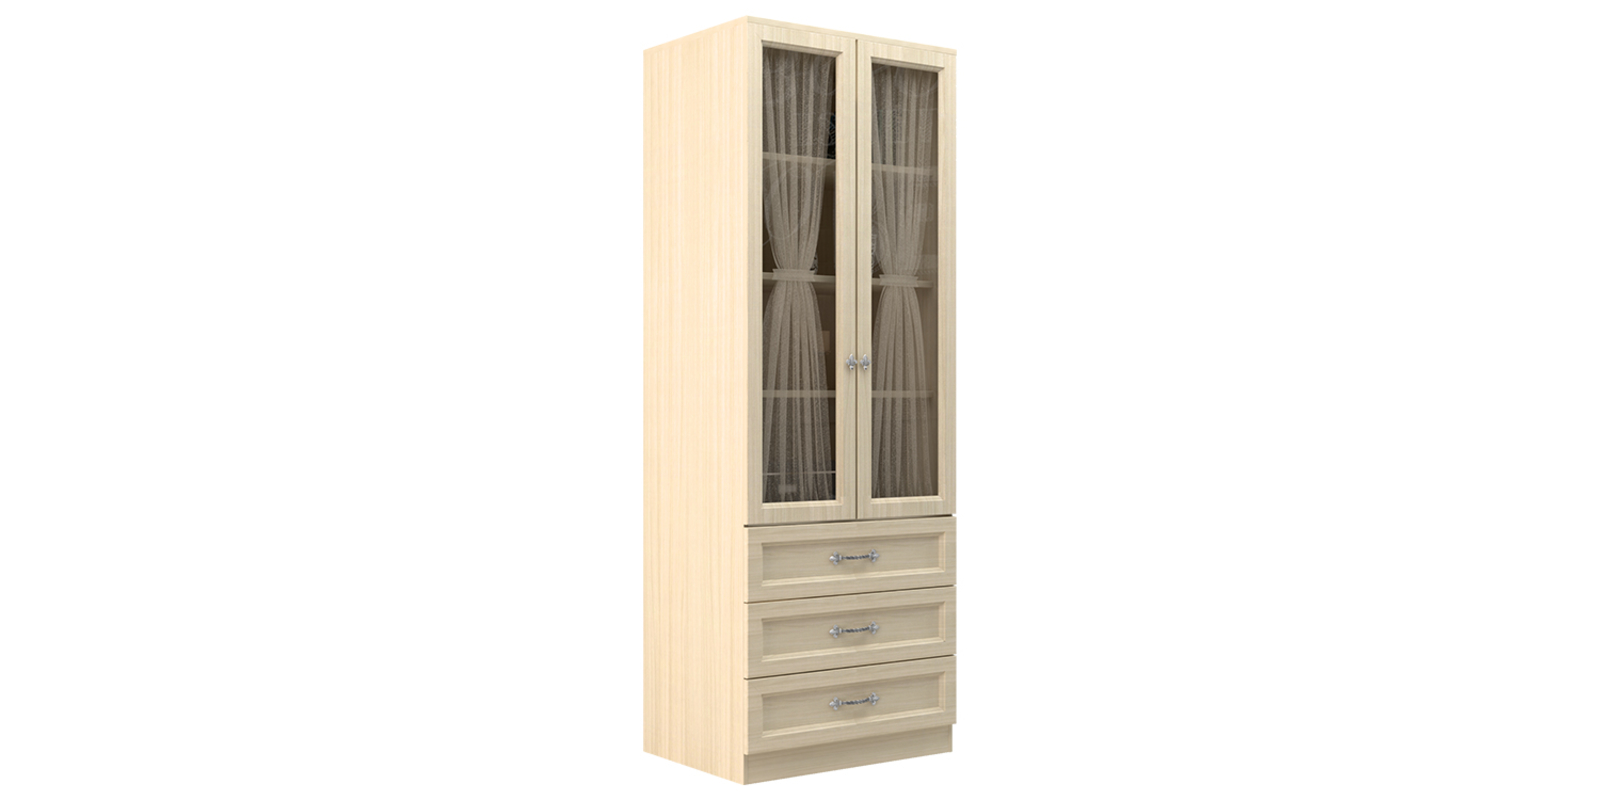 Шкаф витрина Дениз вариант №2 (дуб молочный)